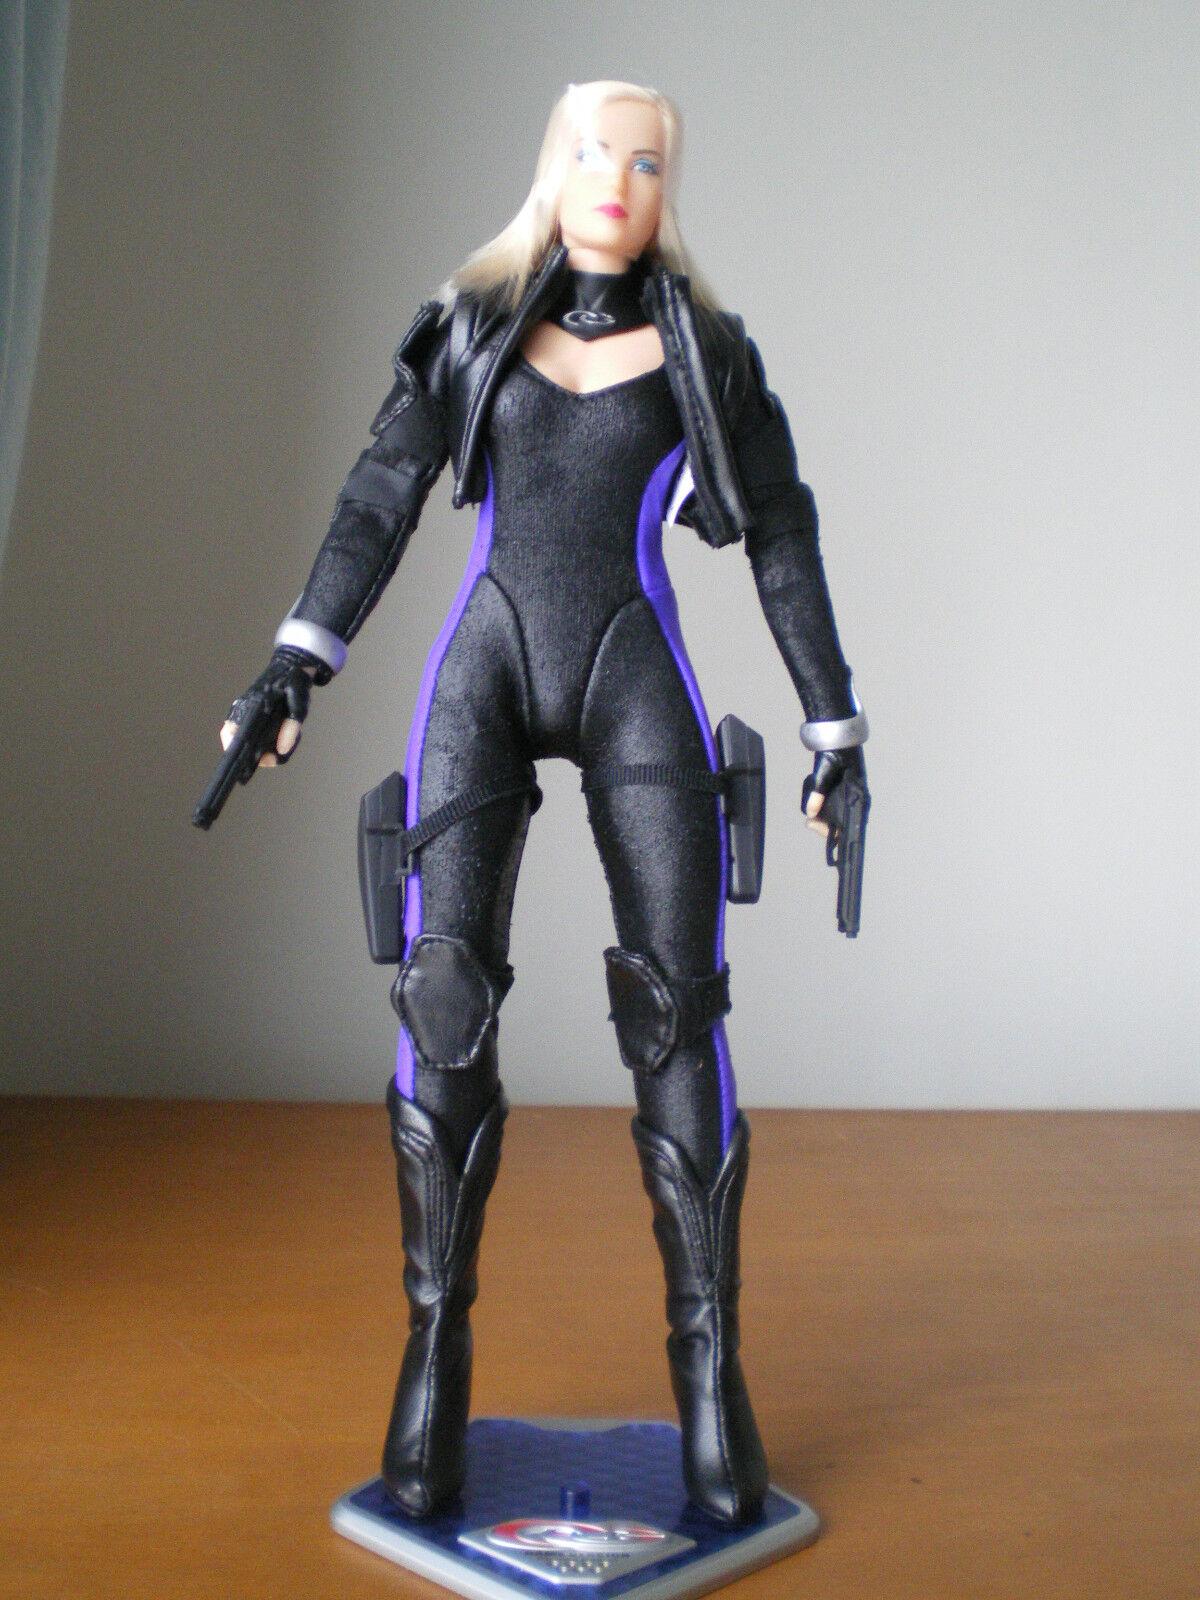 COOL GIRL - CG-01 ICE - 12 inch - PS2 / JAPAN exclusive figure KONAMI - SKY v2.0